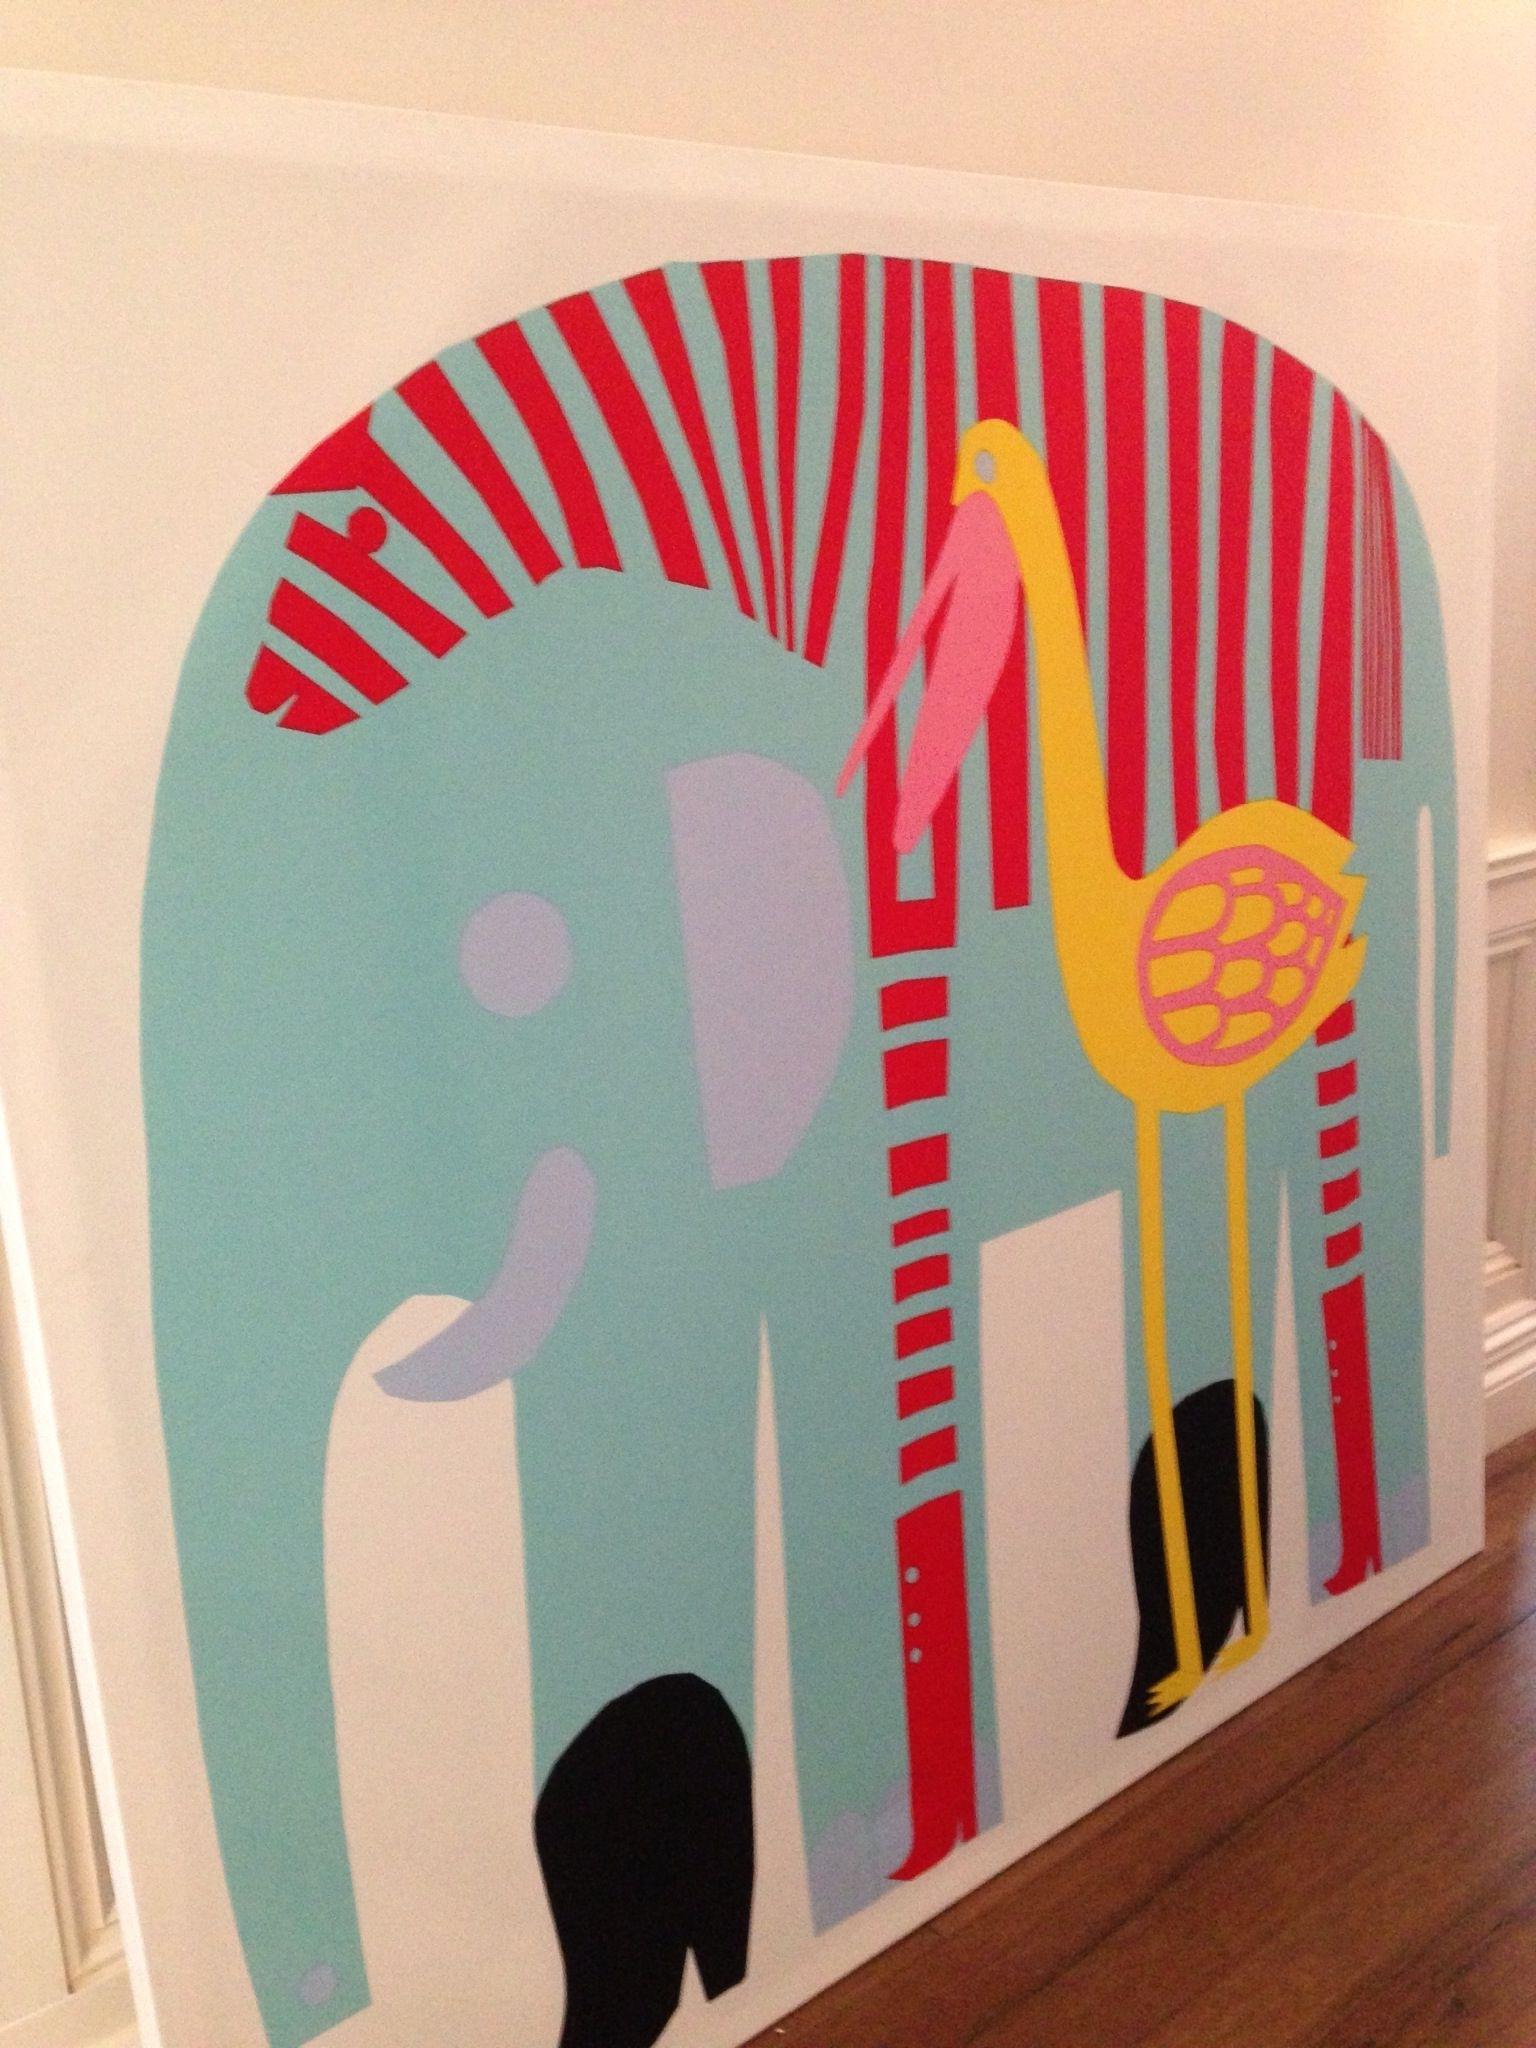 Marimekko Elephant Print For The Kids' Room (View 4 of 15)